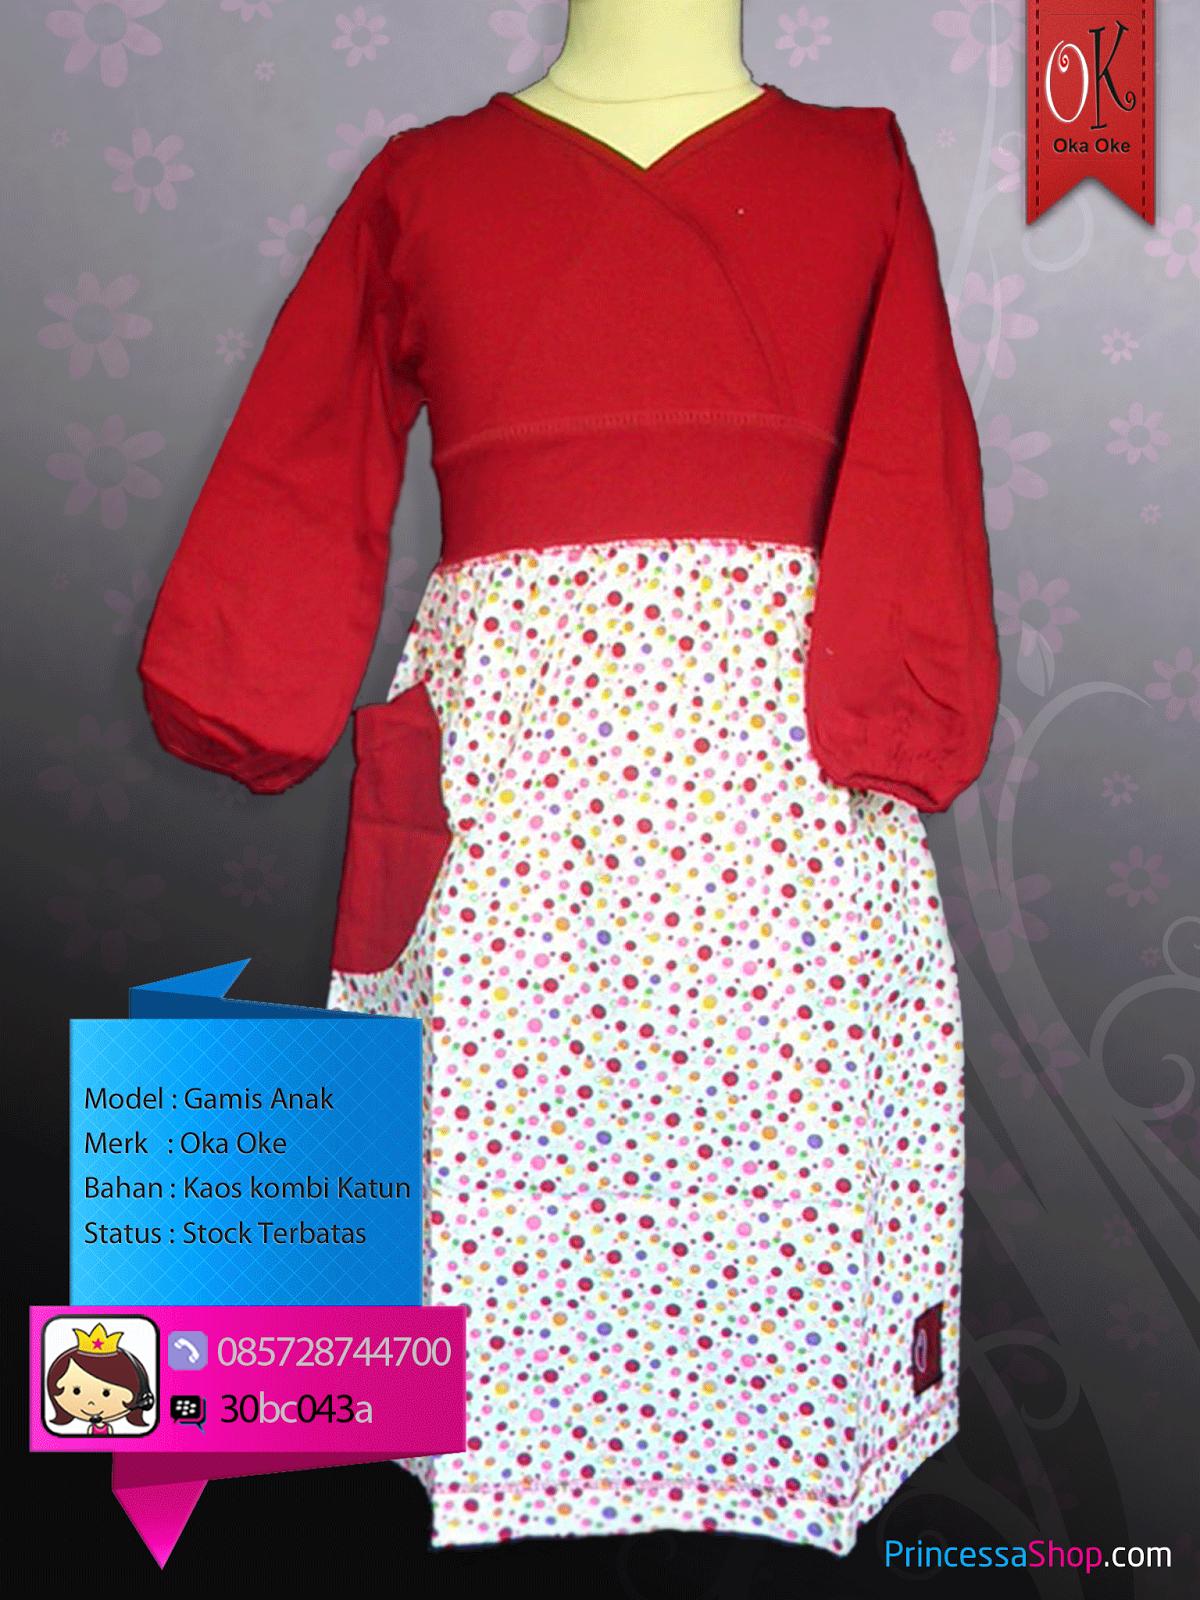 Baju gamis anak perempuan remaja dan balita bahan kaos Baju gamis anak kaos